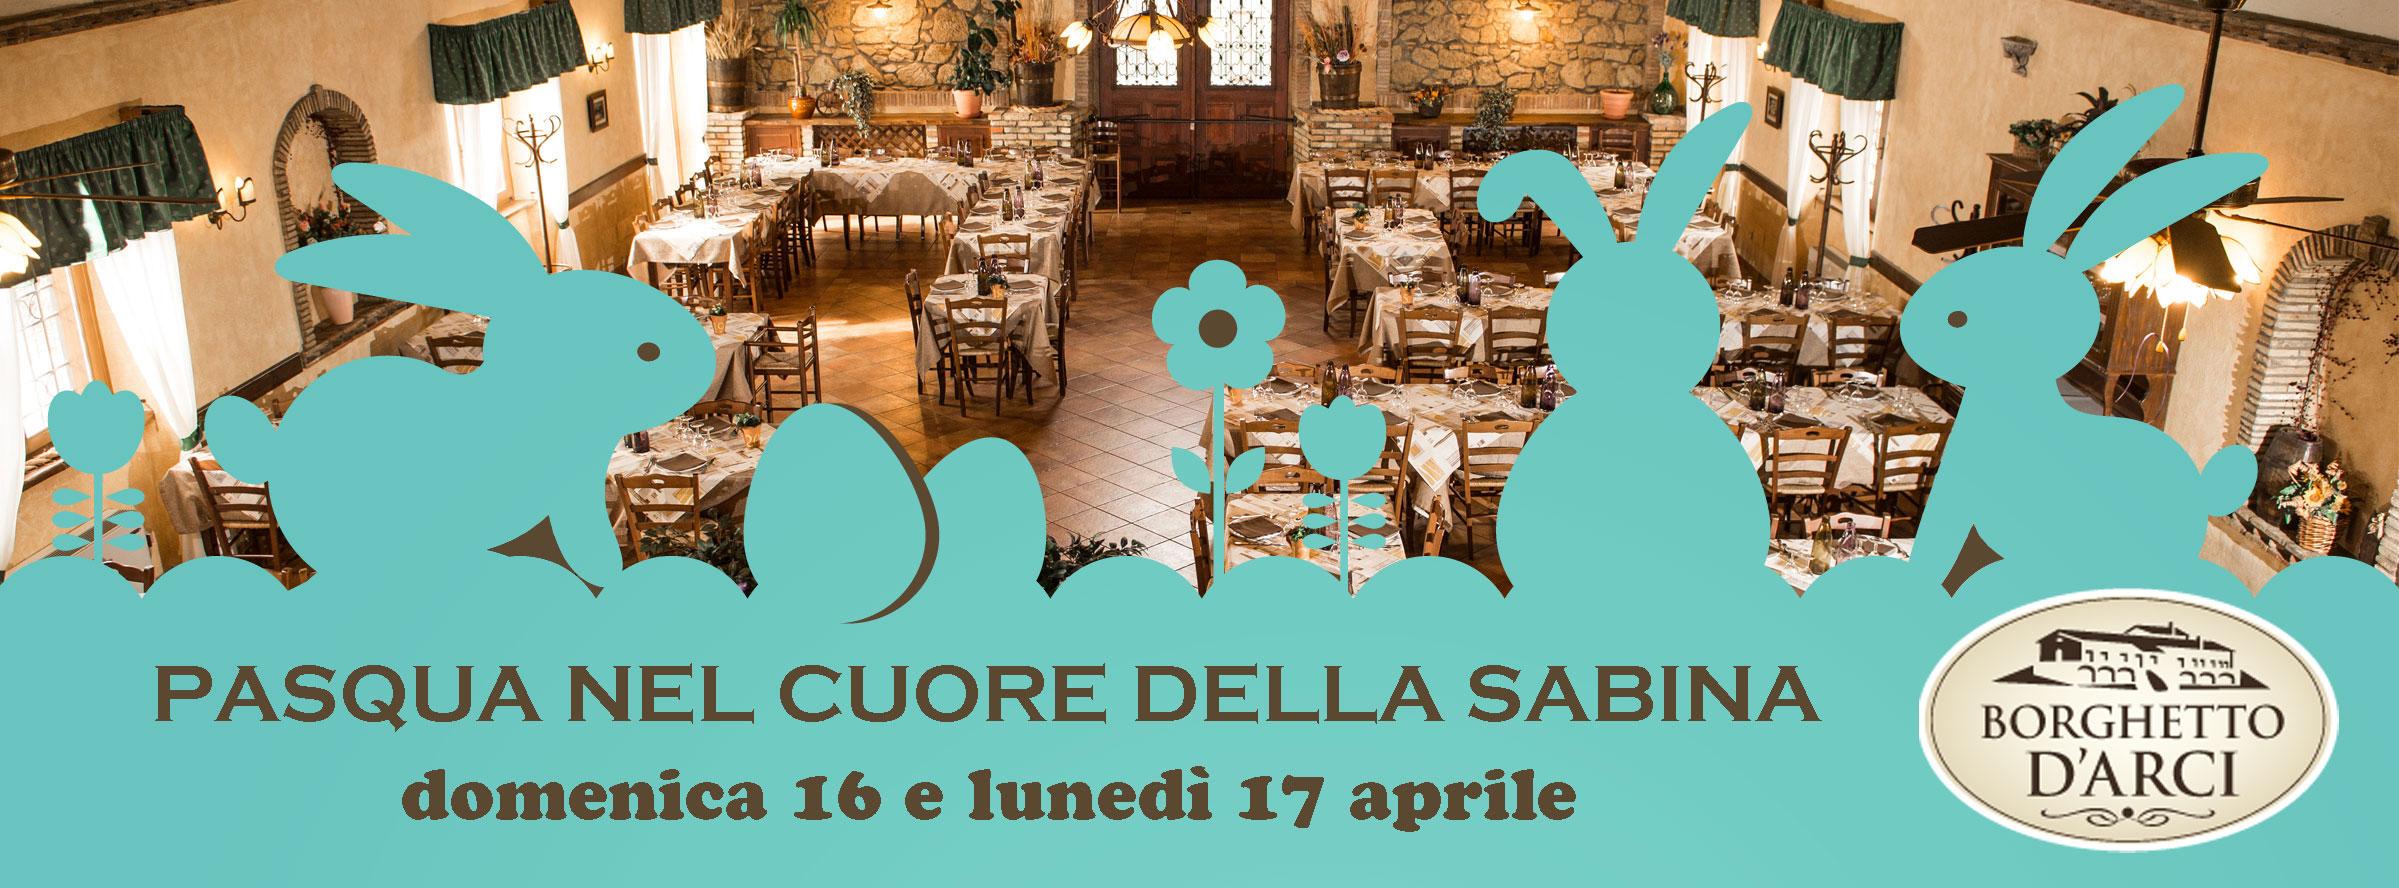 Pasqua 2017 all'Agriturismo Borghetto d'Arci